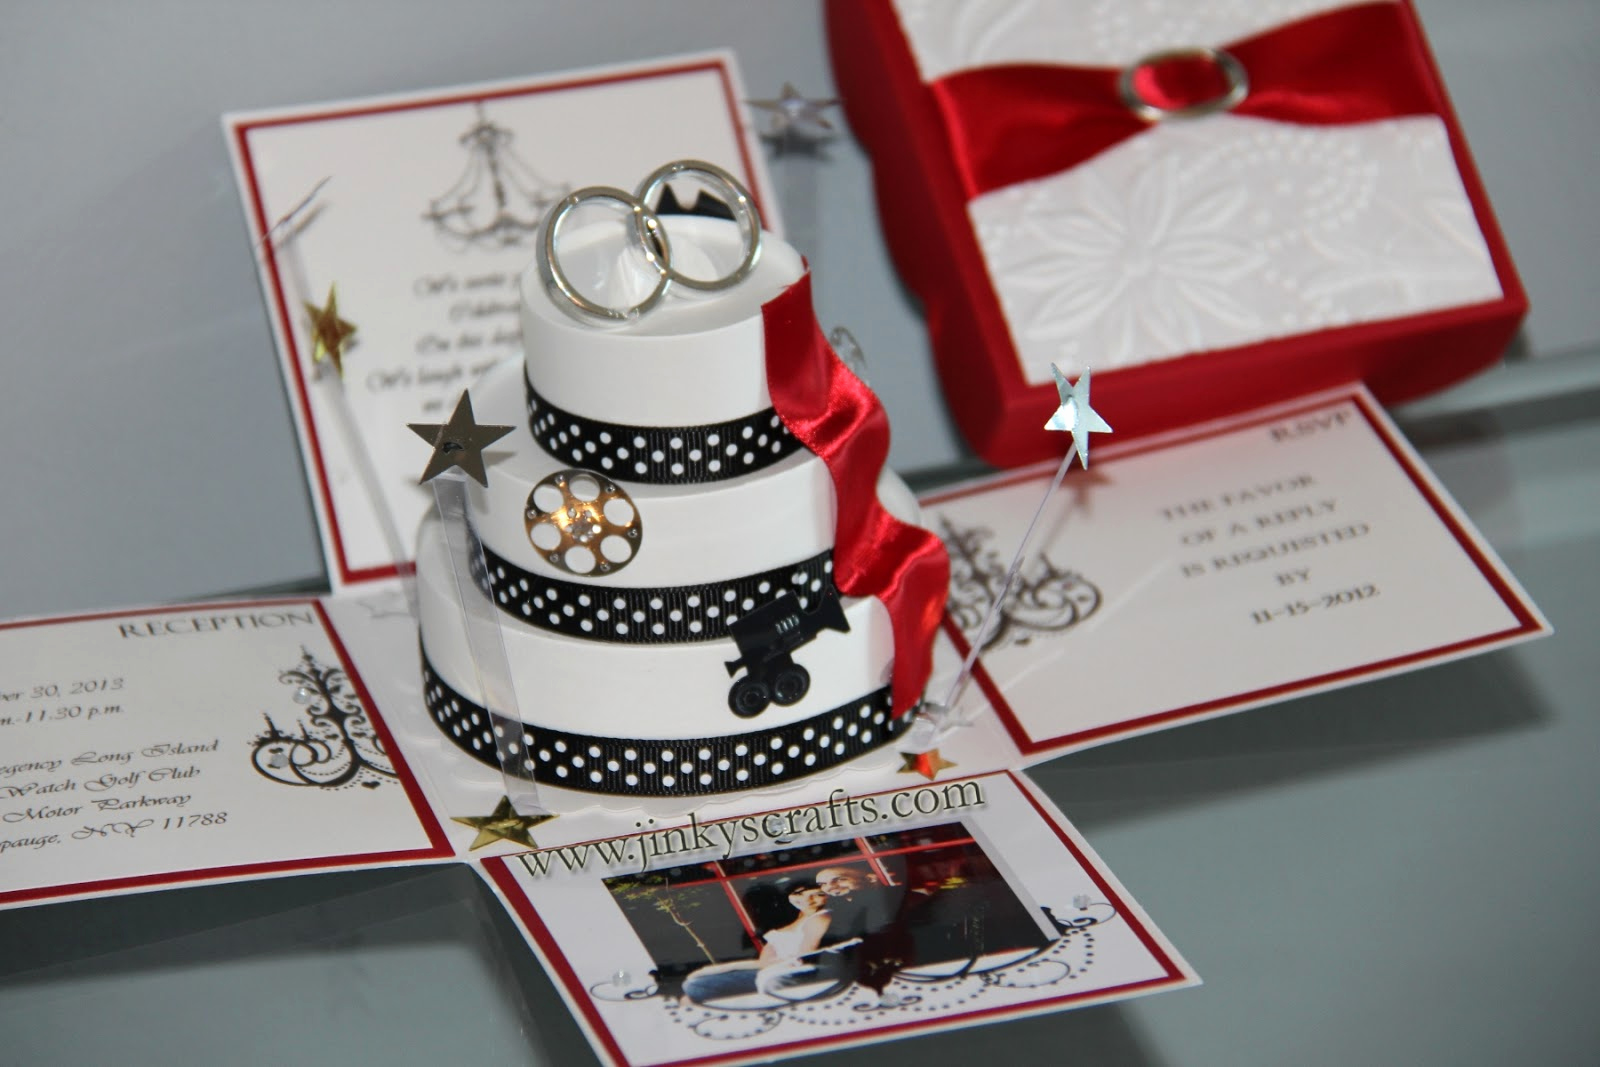 Wedding Invitation Design Ideas Fresh Jinky S Crafts & Designs Hollywood themed Wedding Invitations